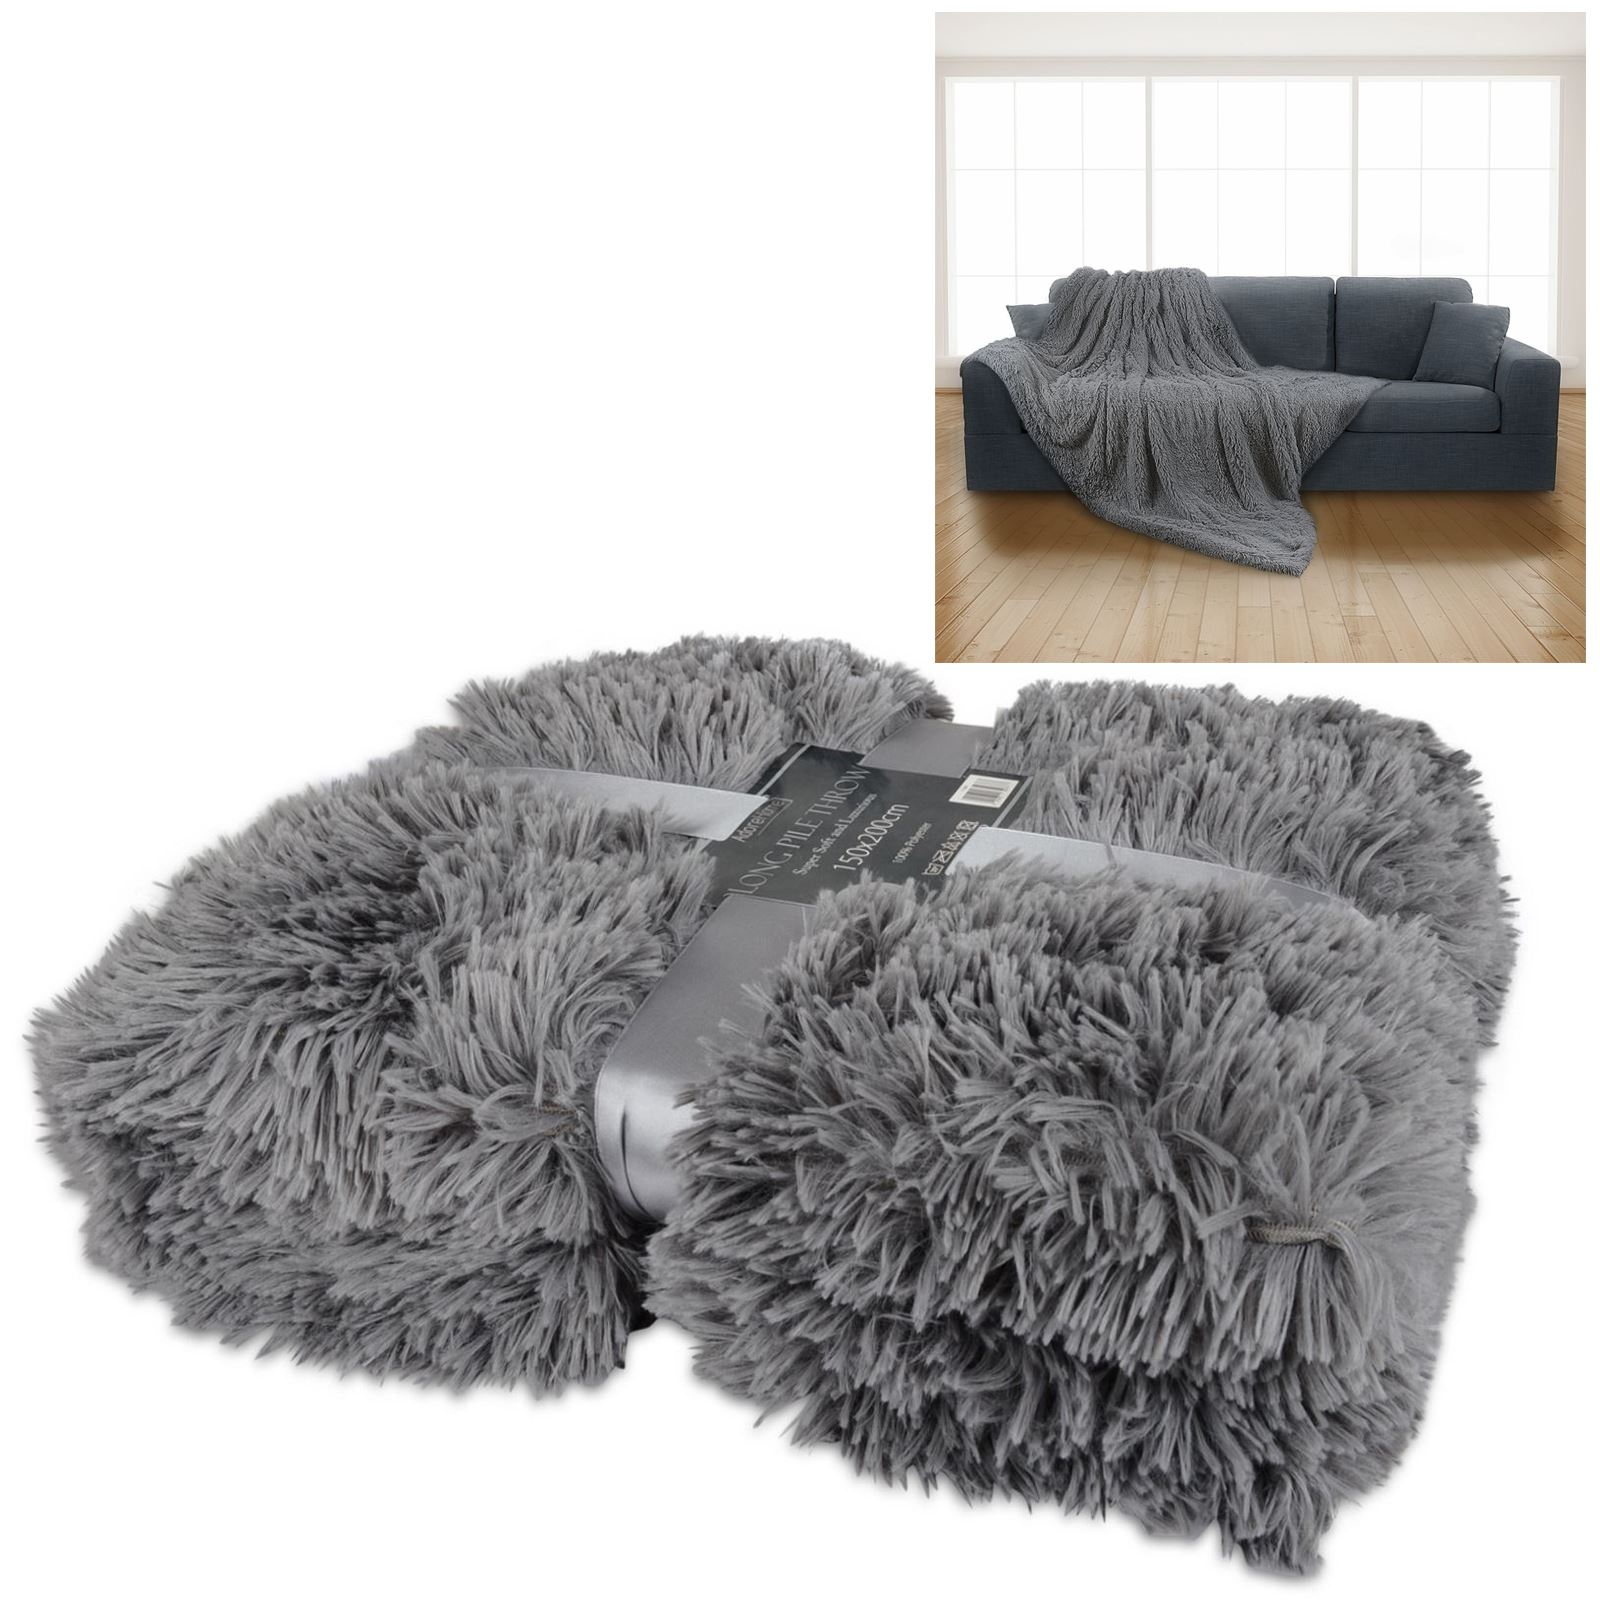 Luxury Long Pile Throw Blanket Super Soft Faux Fur Warm ...